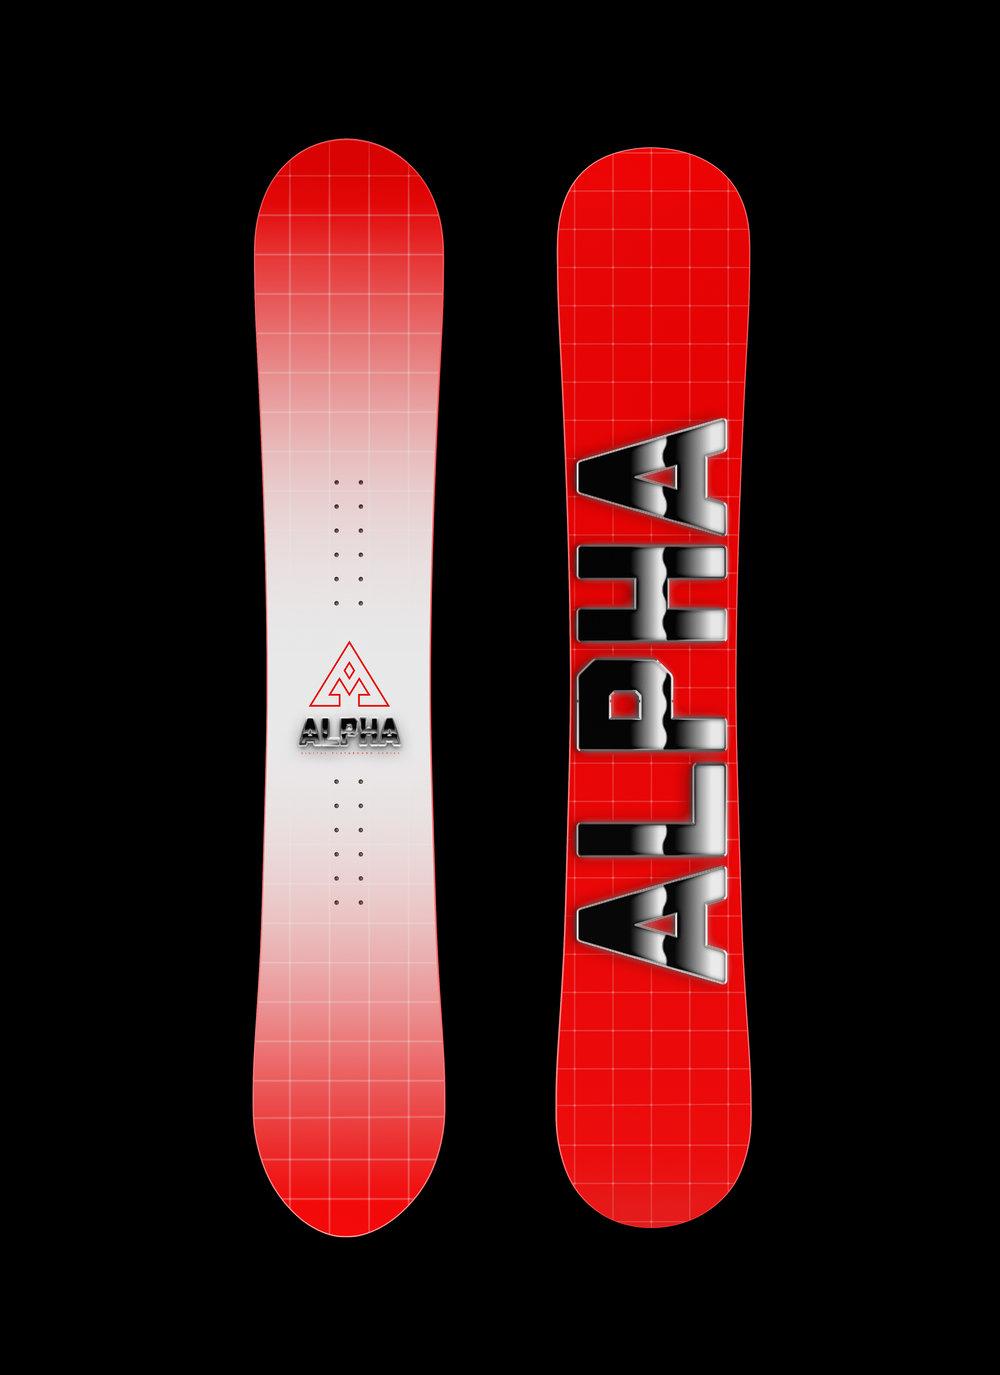 Grid Board2 Blacl.jpg